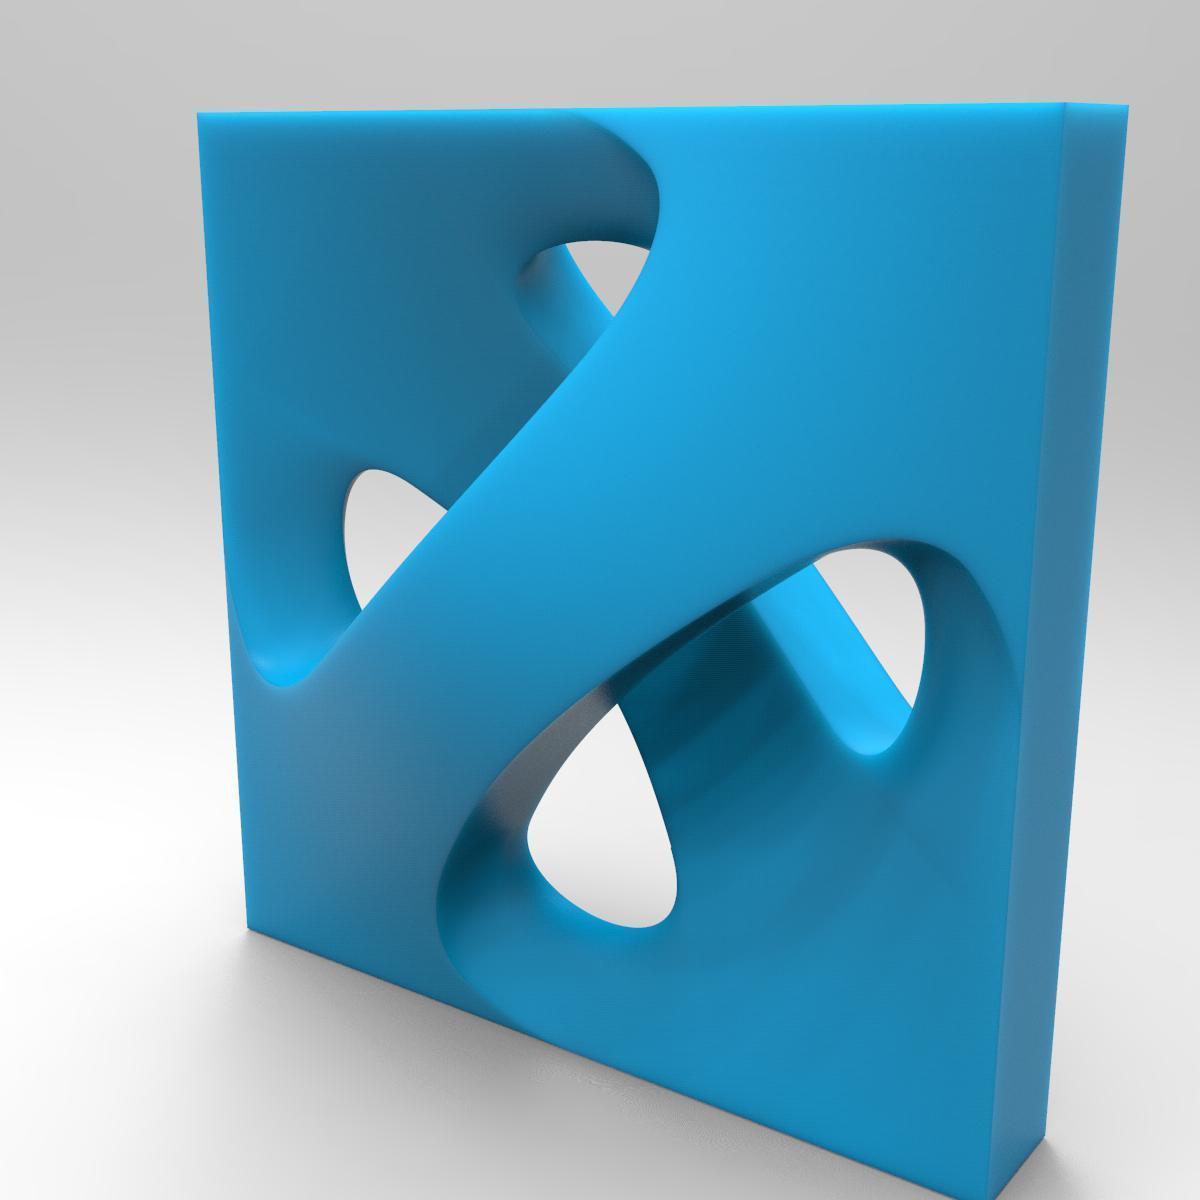 JPG__untitled.36.jpg Download STL file Modular unit • Model to 3D print, 6cubes